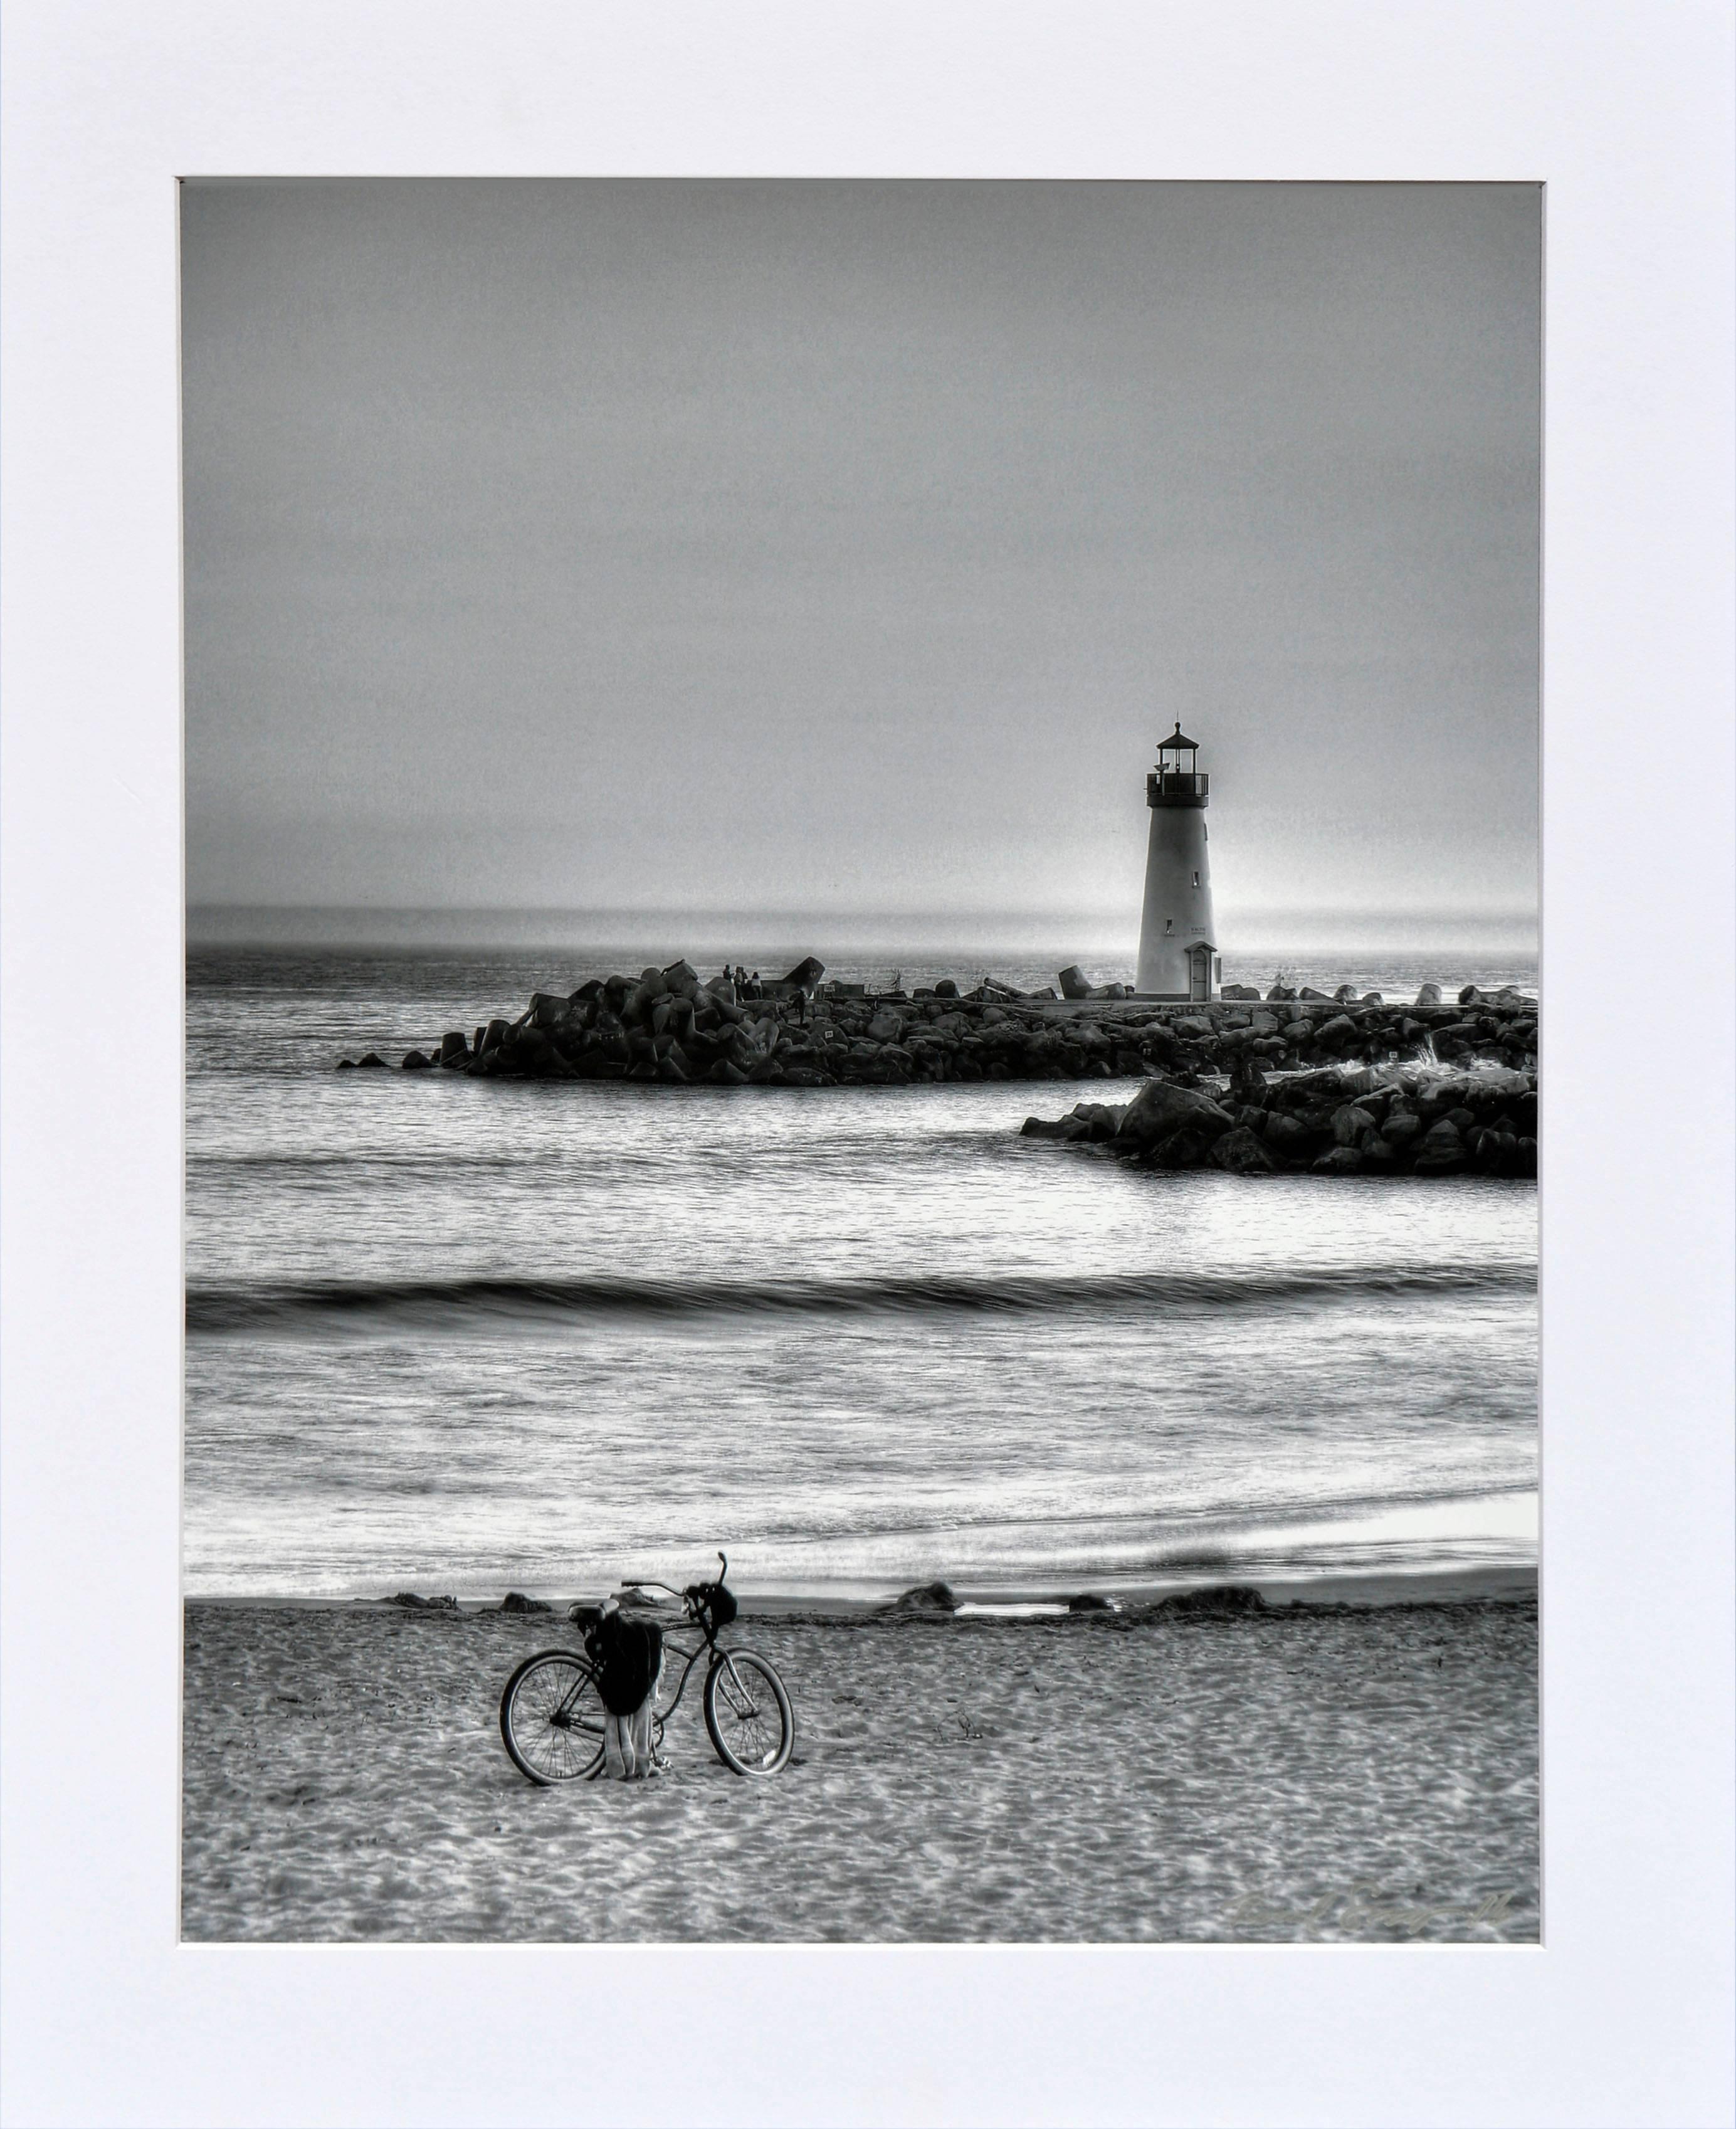 Lighthouse with Beach Cruiser - Black & White Landscape Photograph